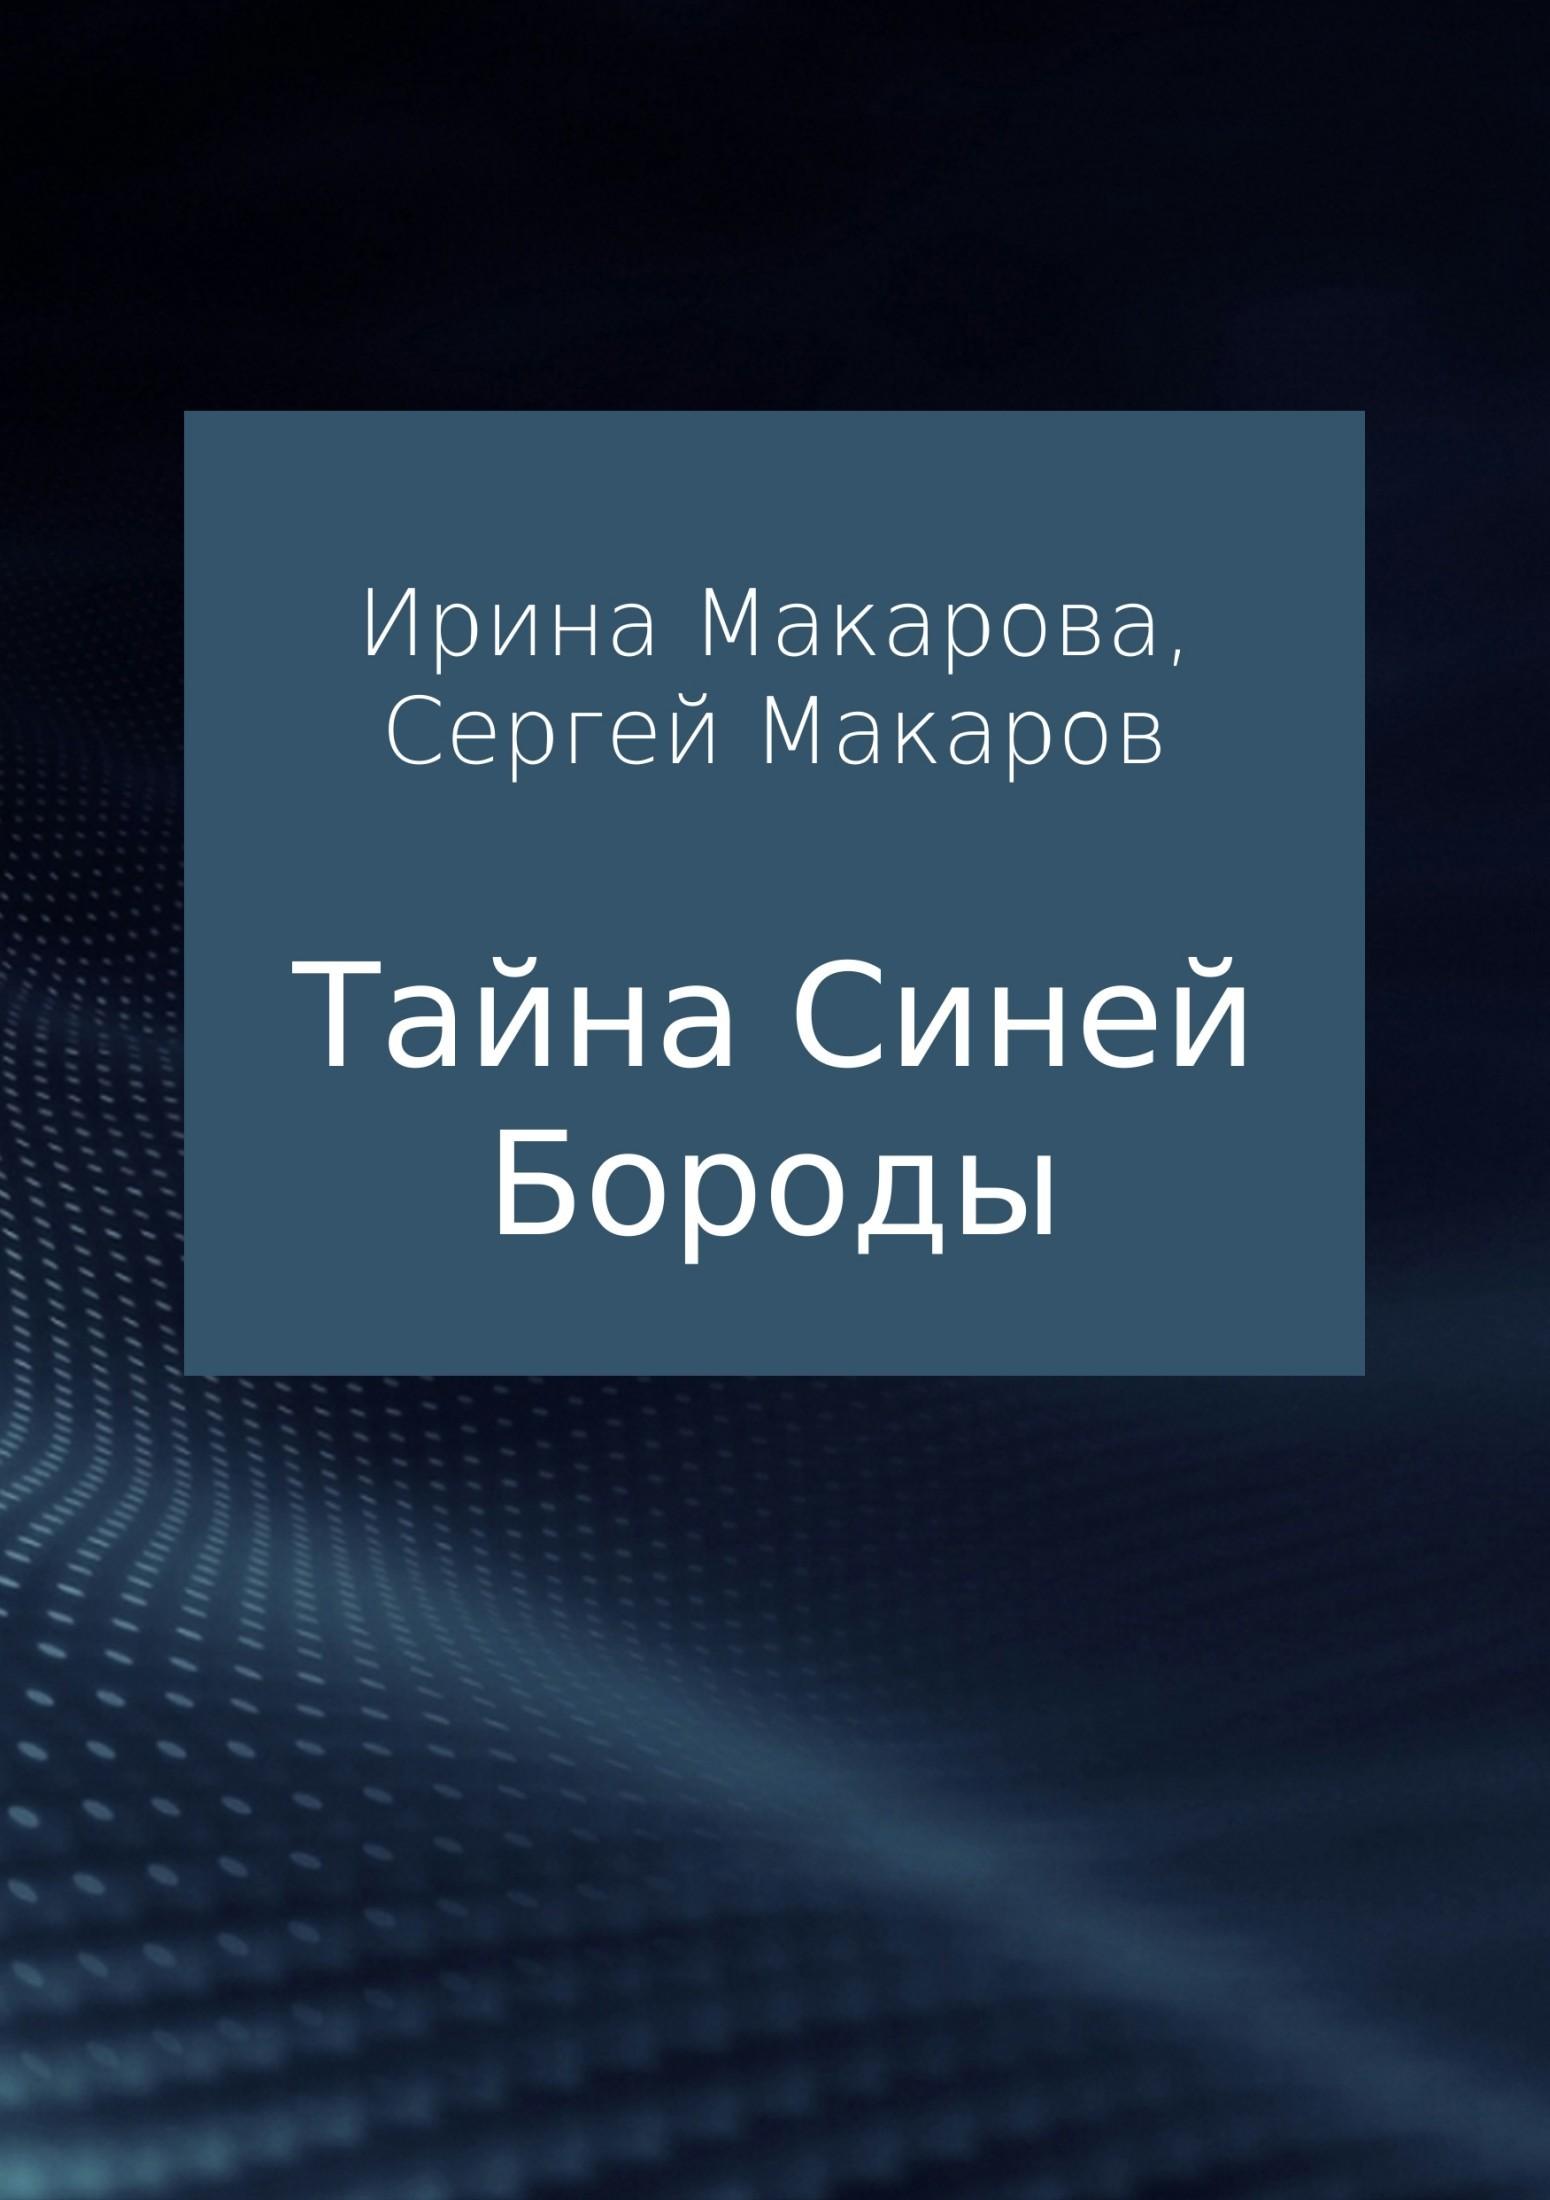 Сергей Александрович Макаров Тайна Синей Бороды ISBN: 978-5-5321-2685-5 цена